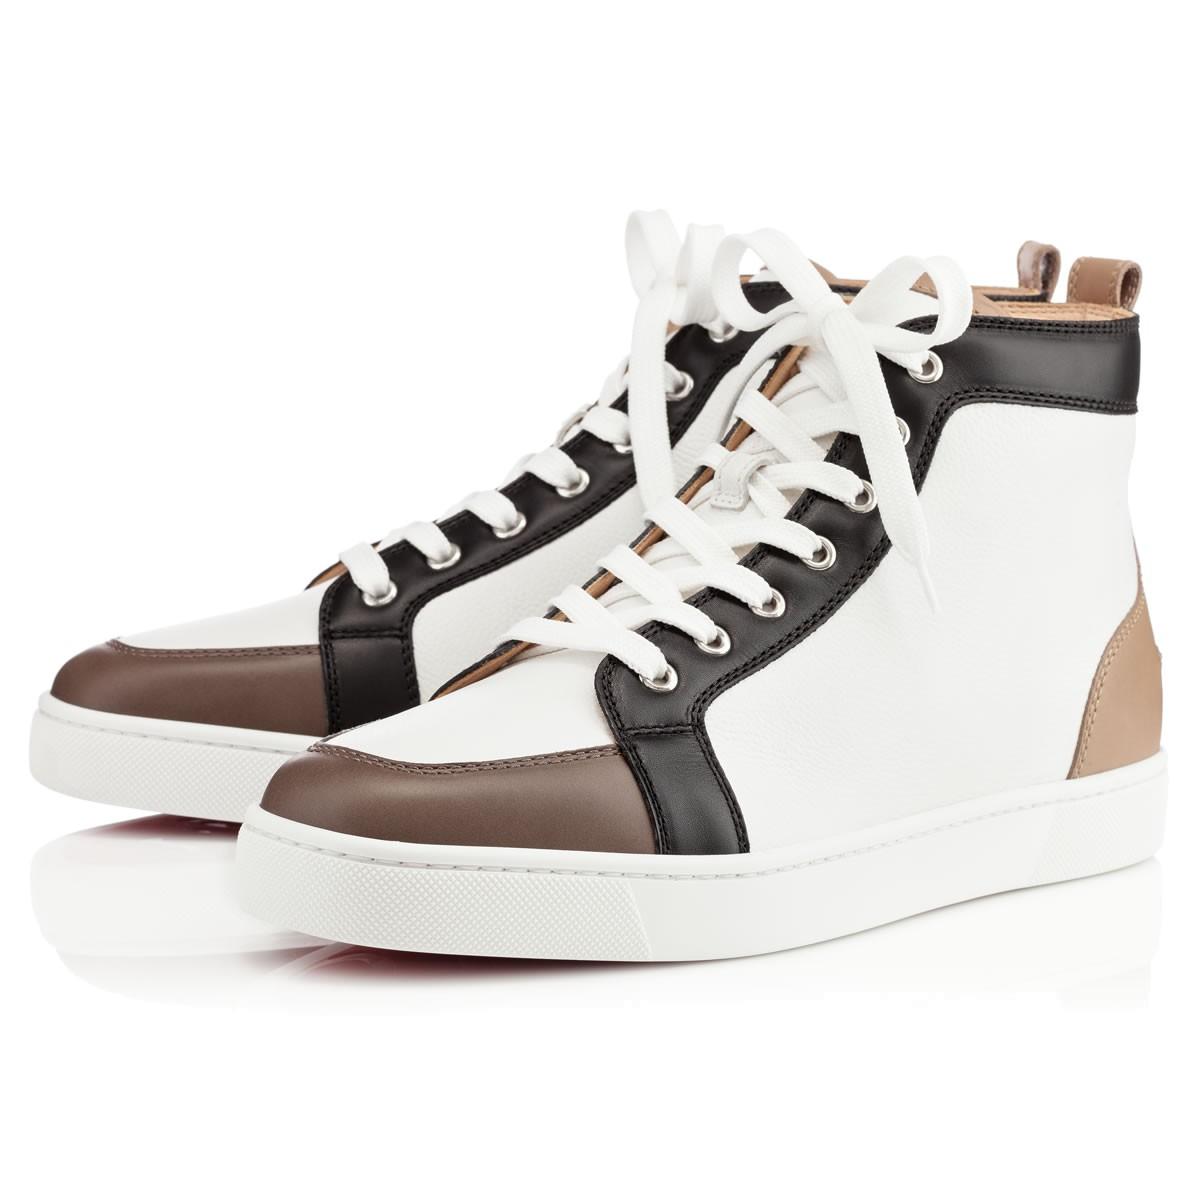 Mens Fashionable White Shoes